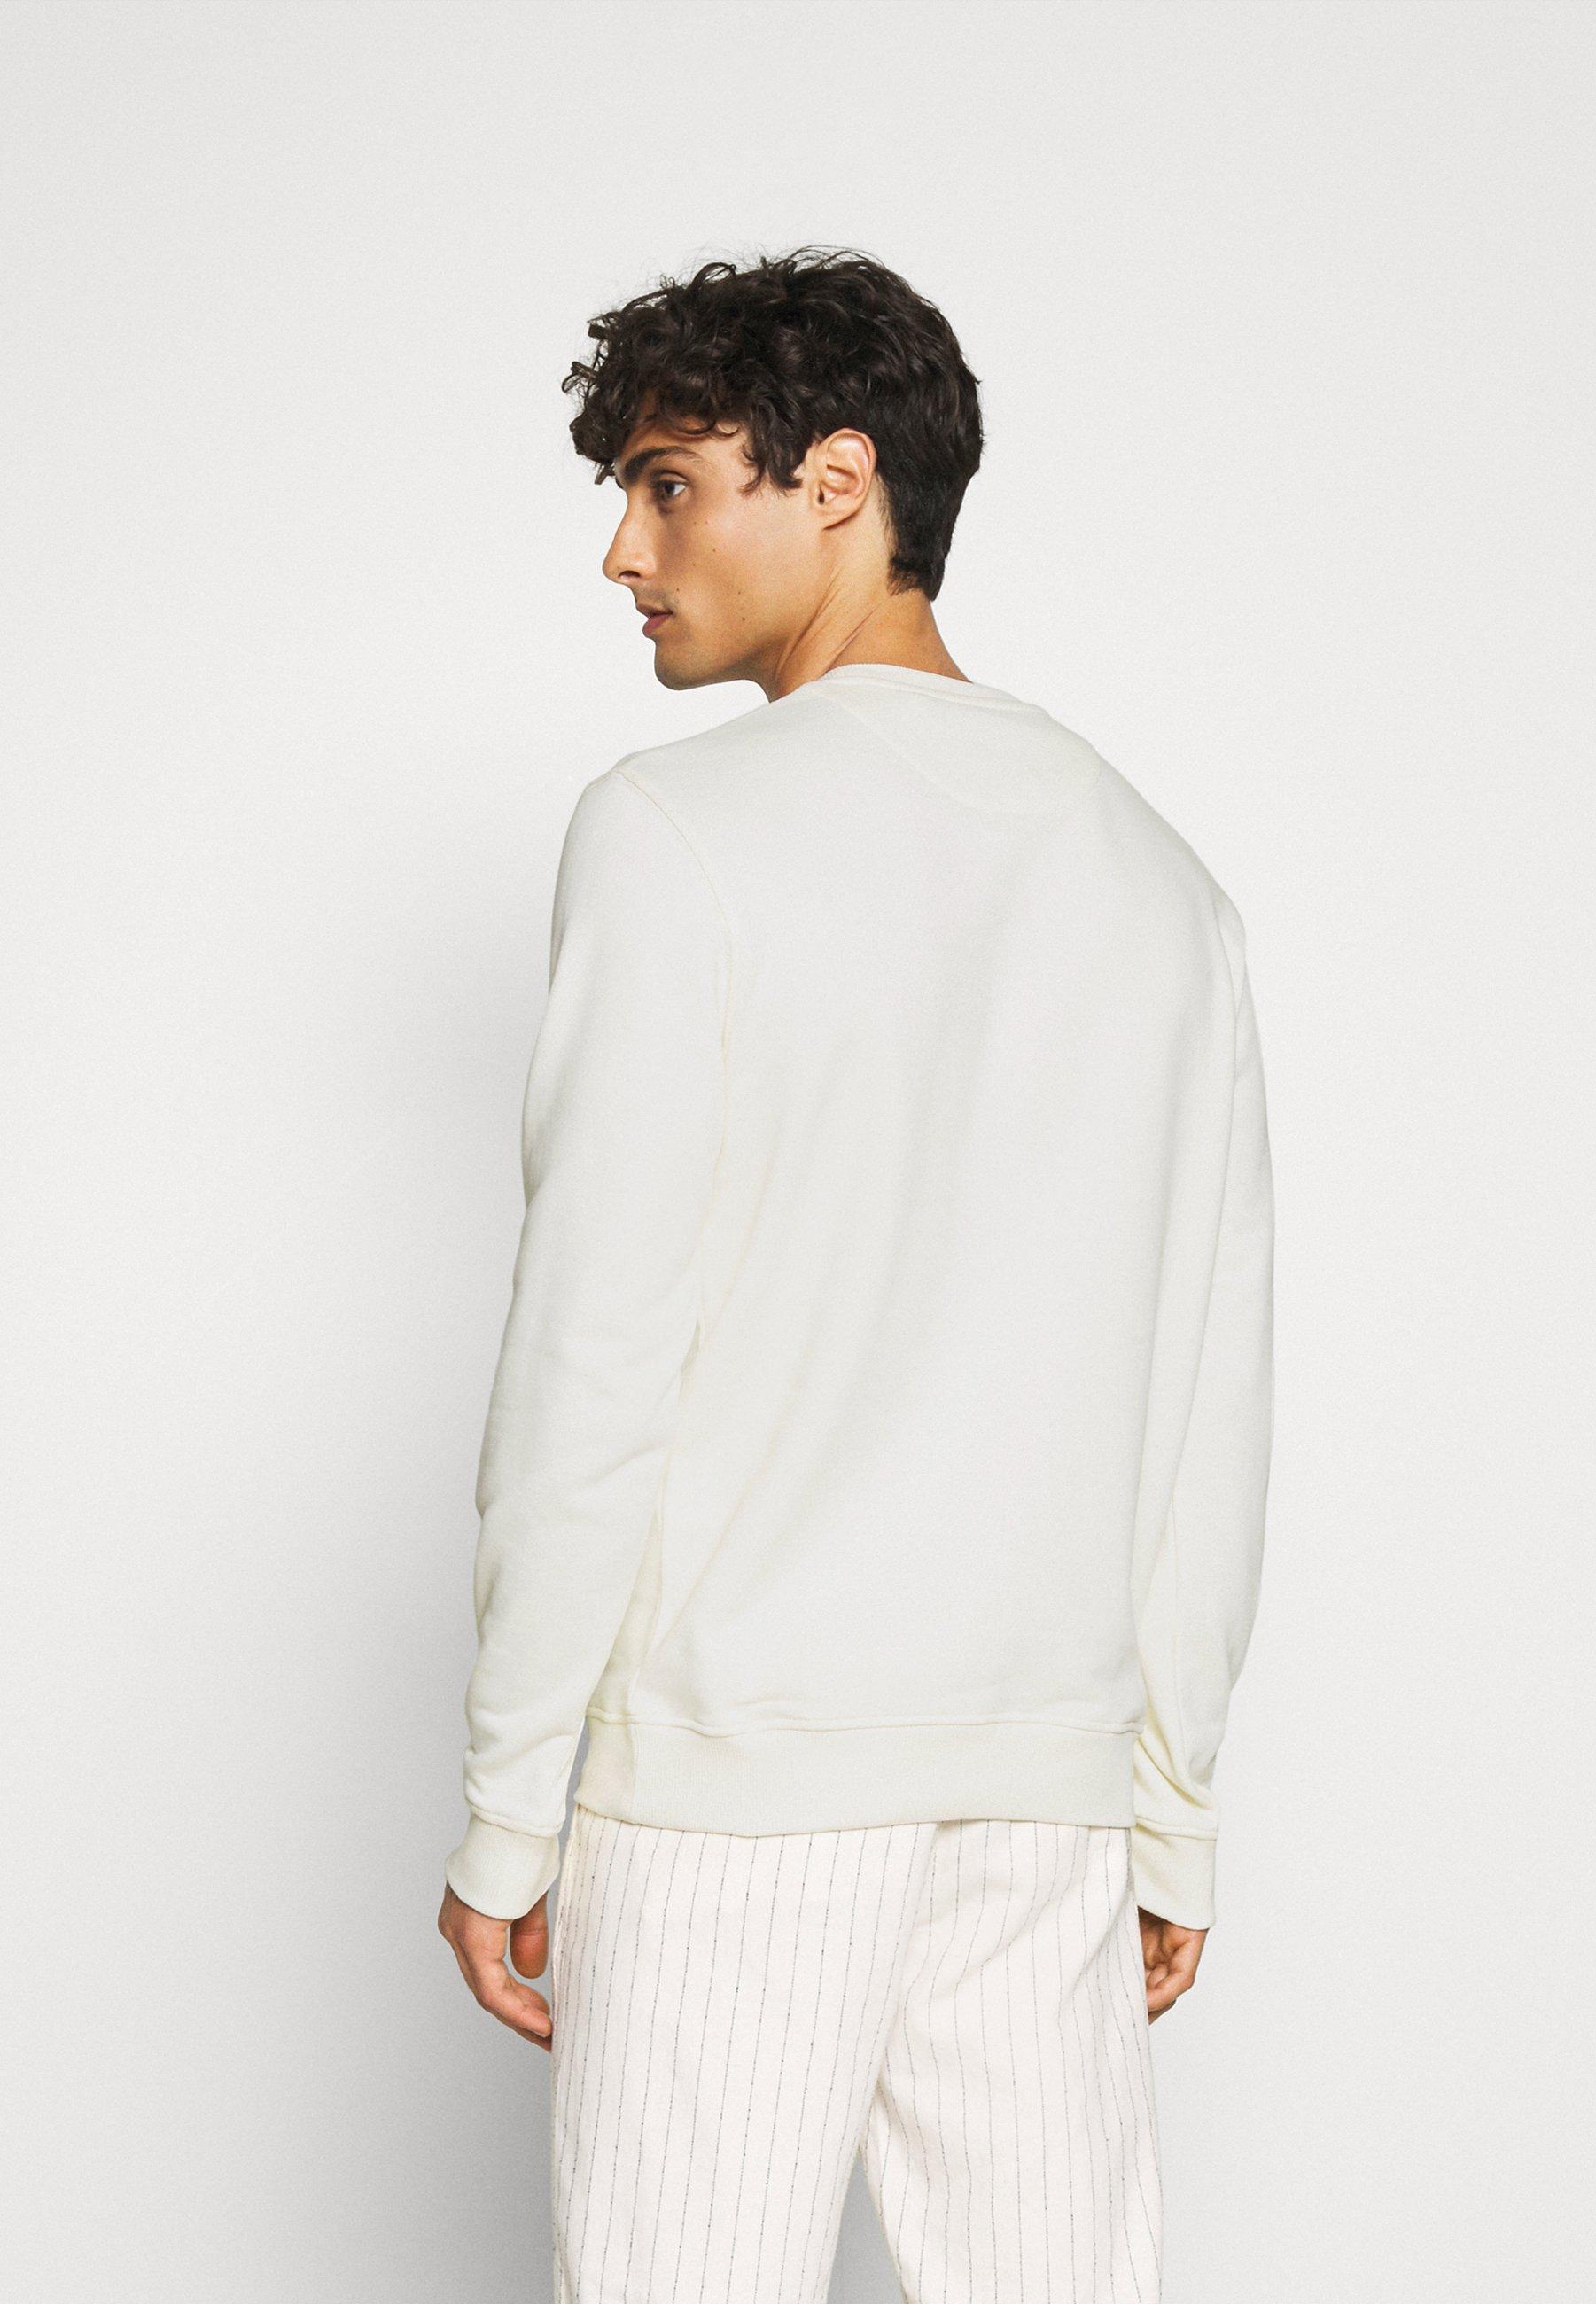 Lyle & Scott Crew Neck - Sweatshirt Vanilla Ice/offwhite